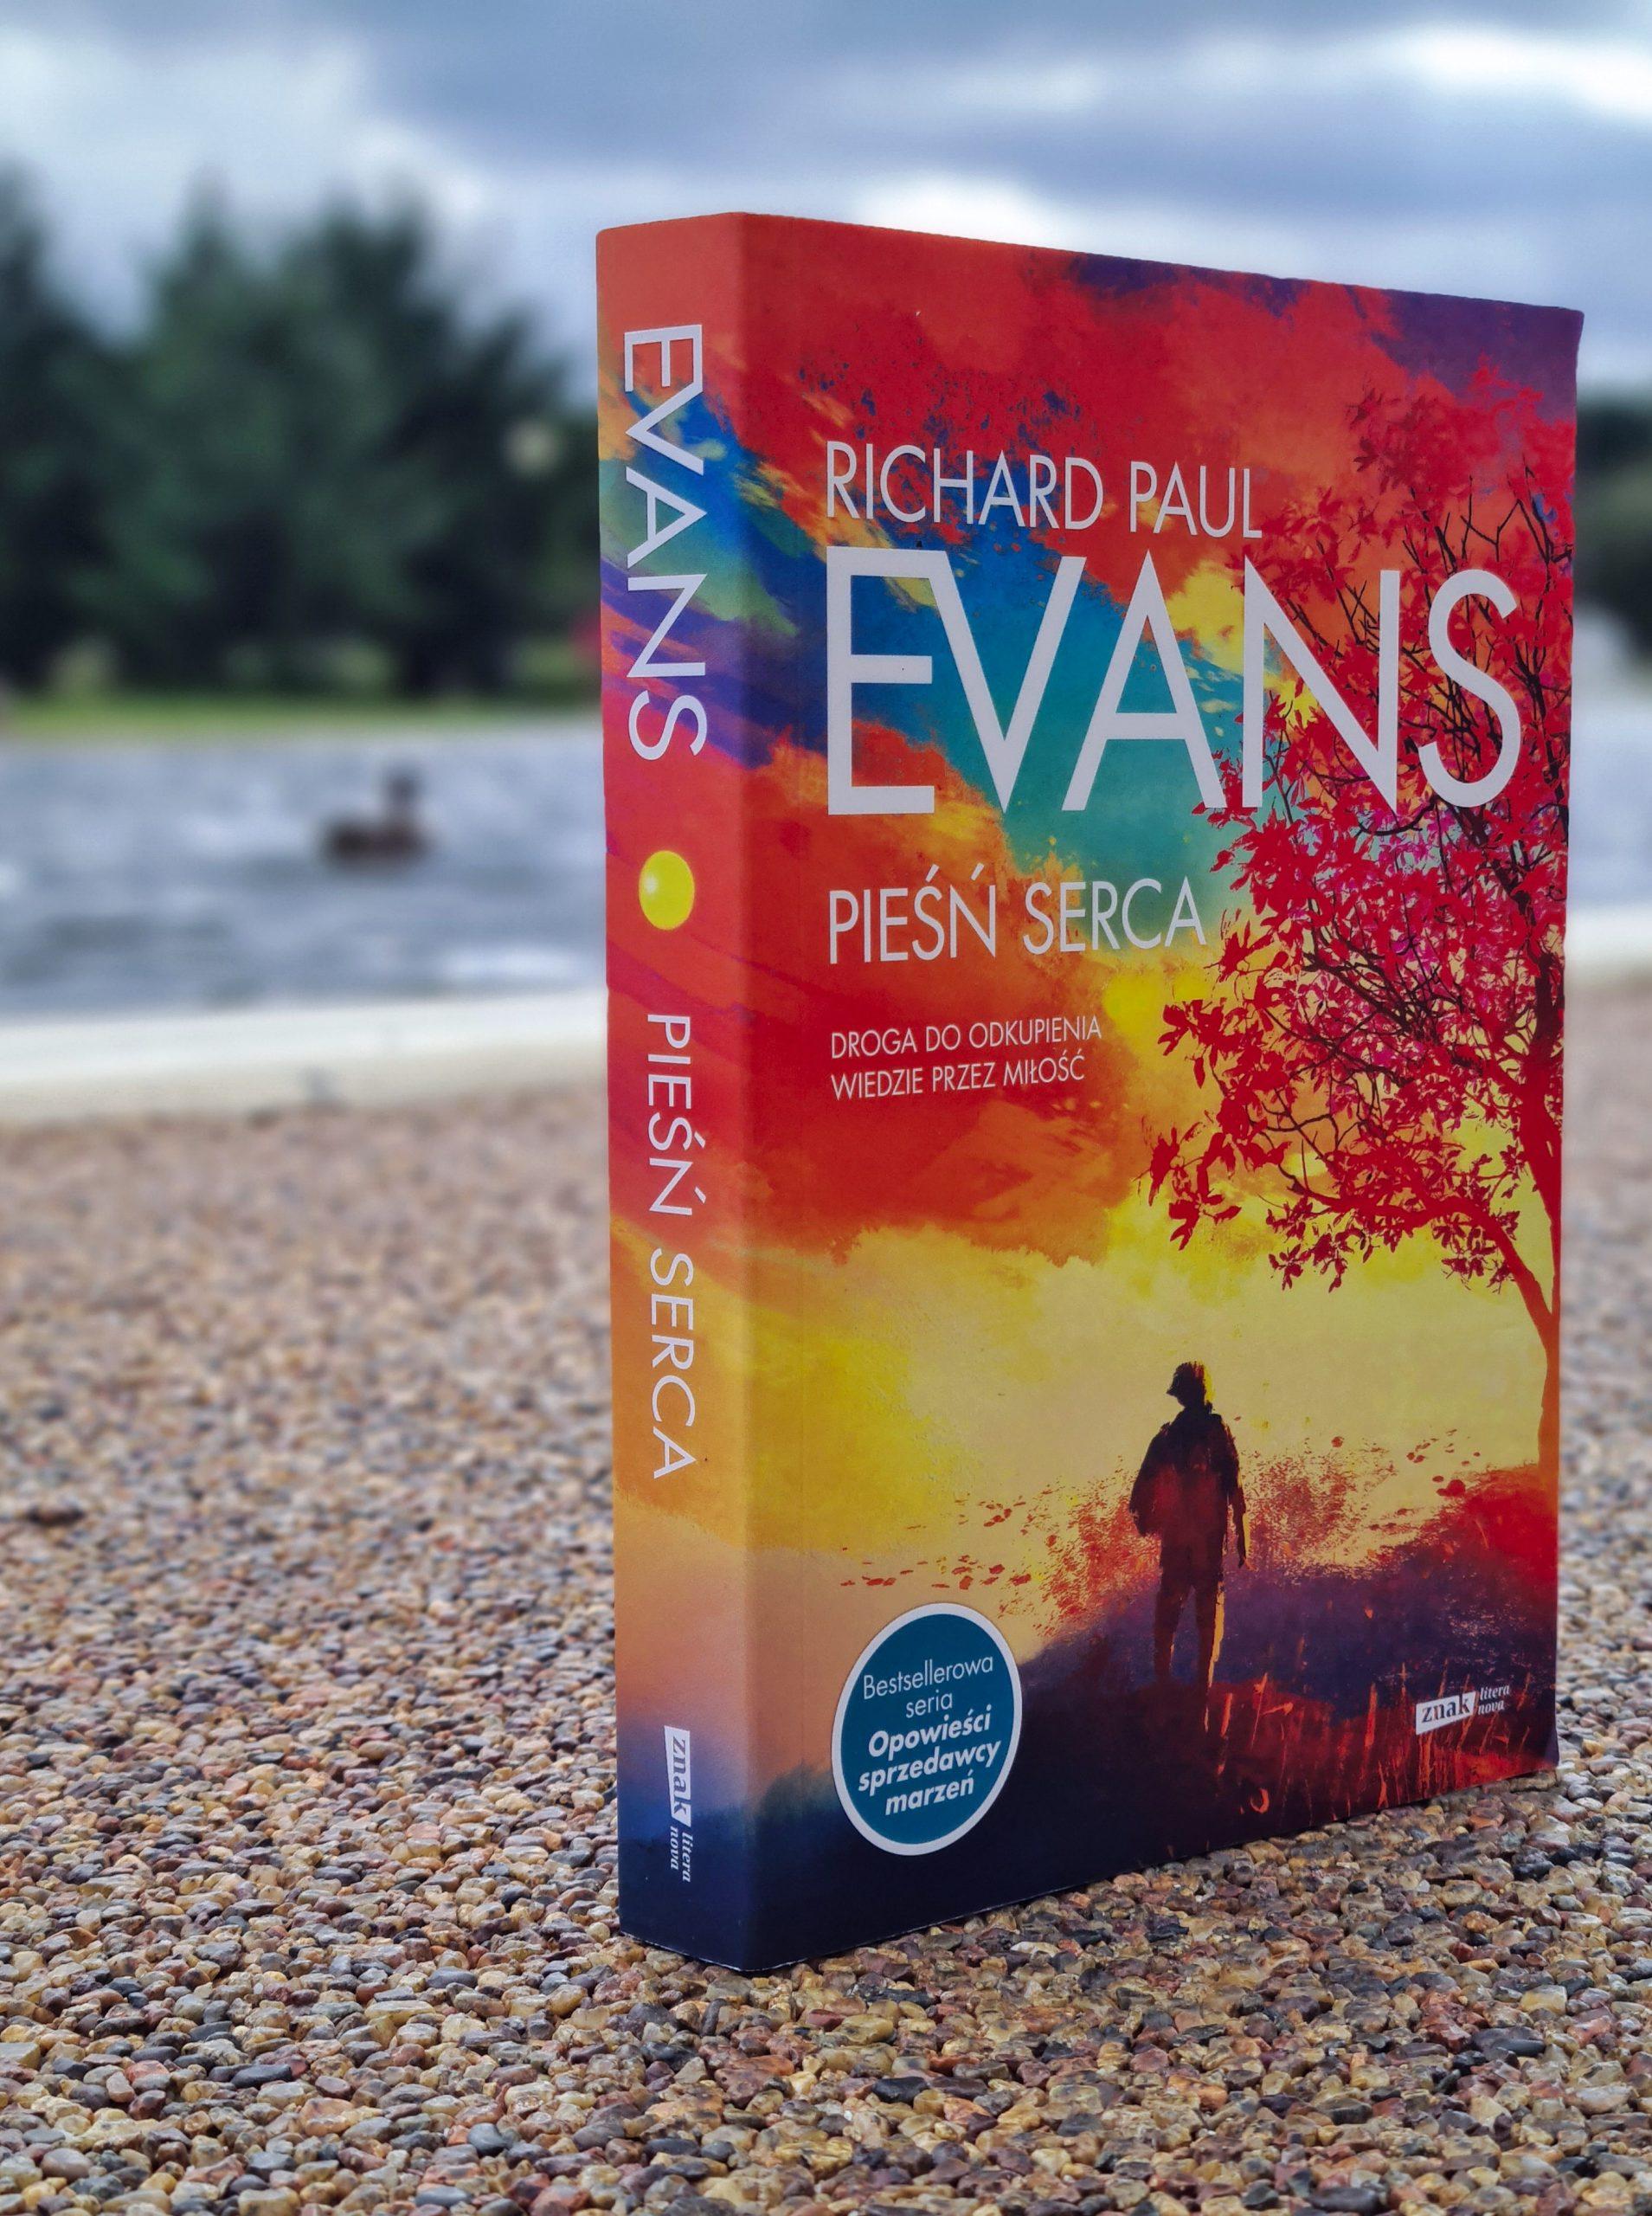 Pieśń serca – Richard Paul Evans